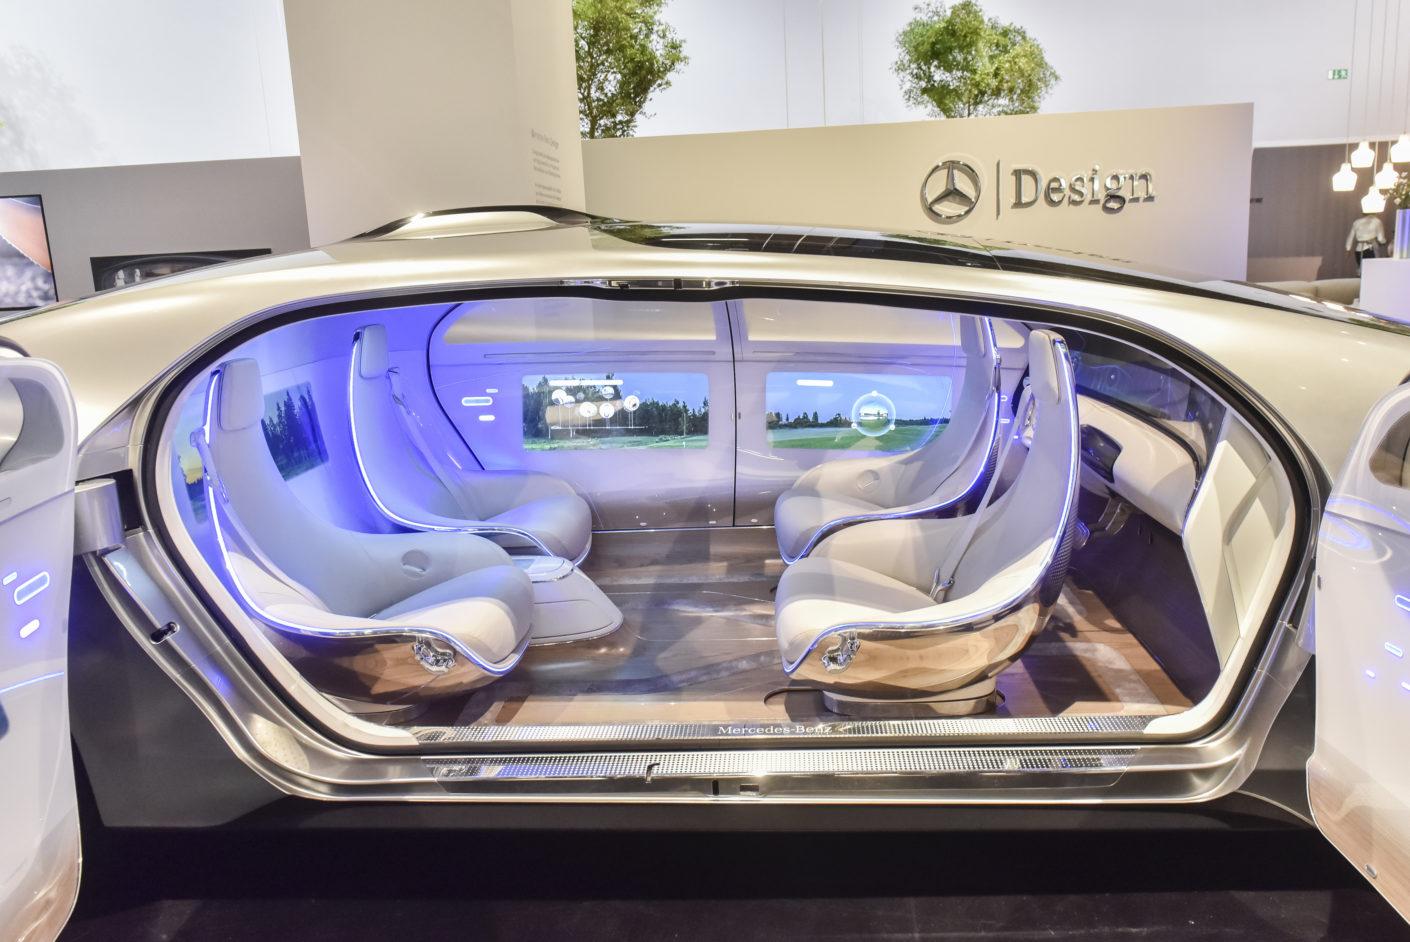 Mercedes-Benz Studie, Vitra Halle, Orgatec 2016